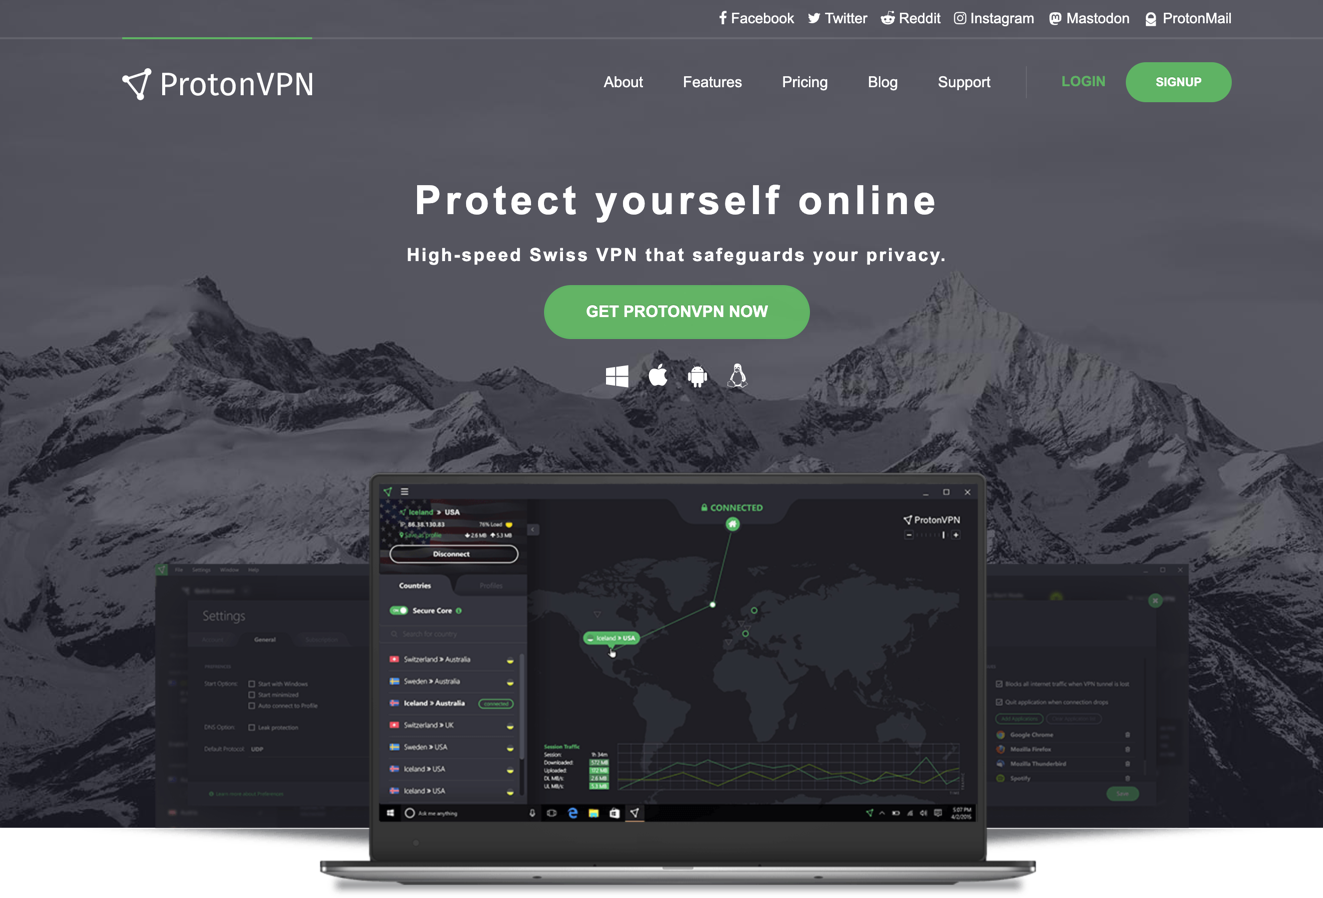 protonvpn homepage